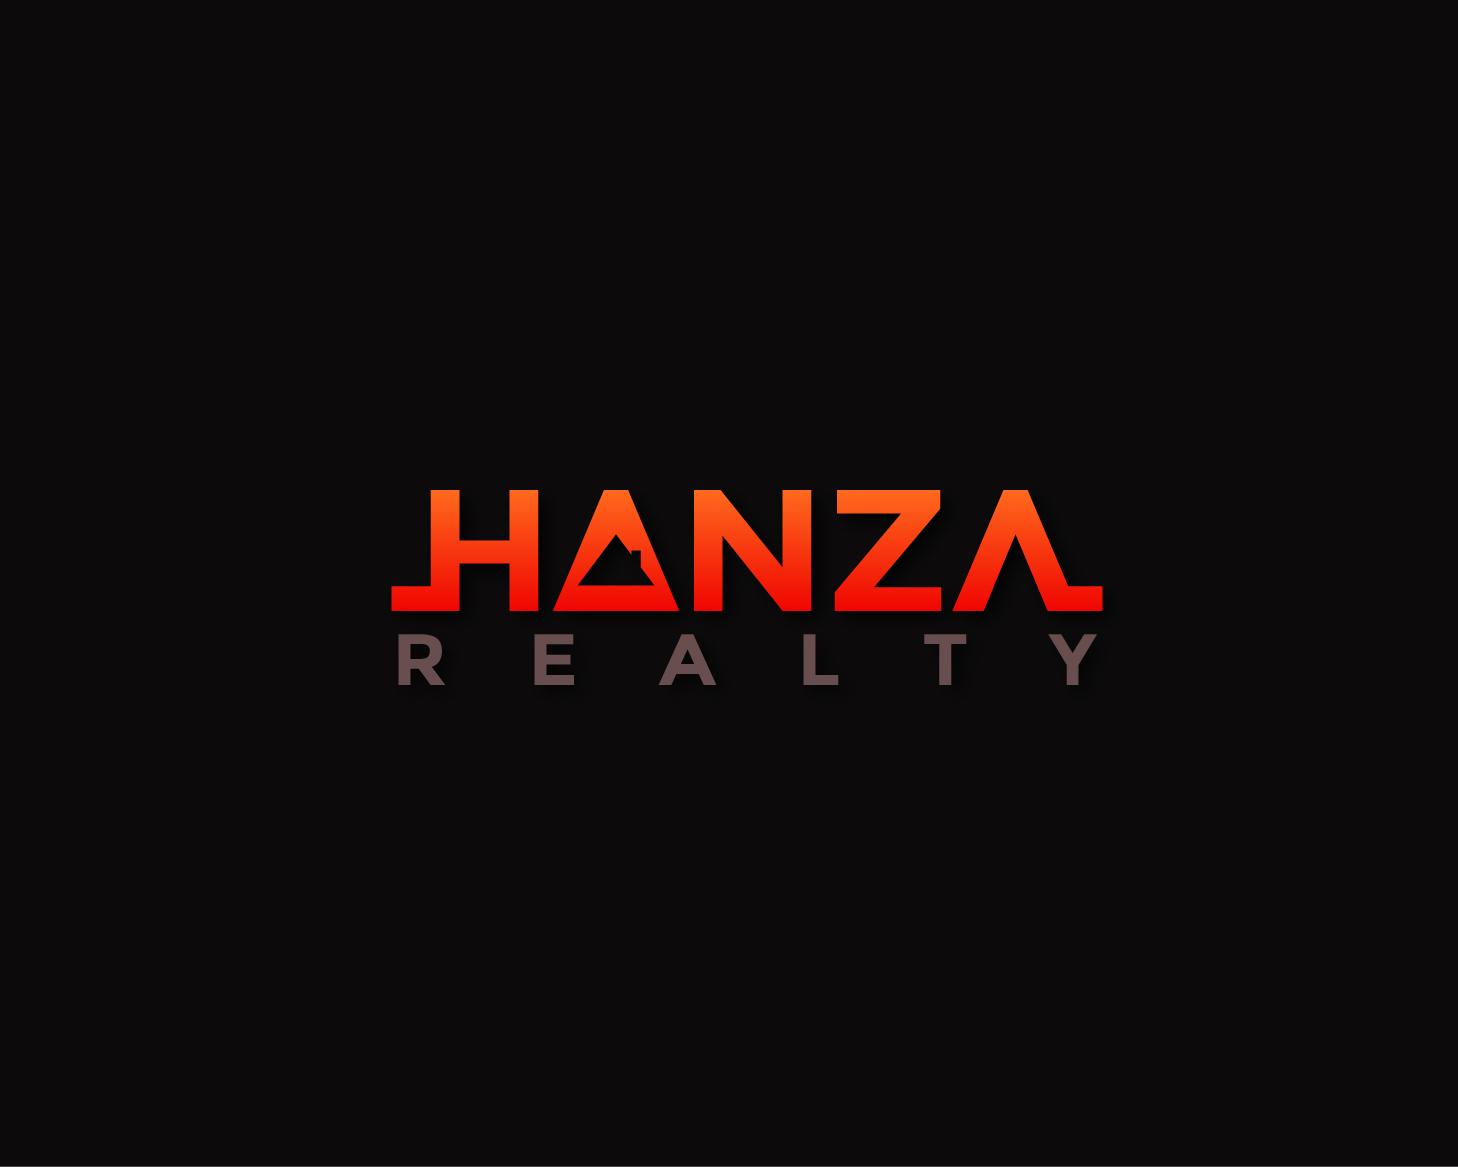 Logo Design by Allan Esclamado - Entry No. 119 in the Logo Design Contest Logo Design for Hanza Realty.